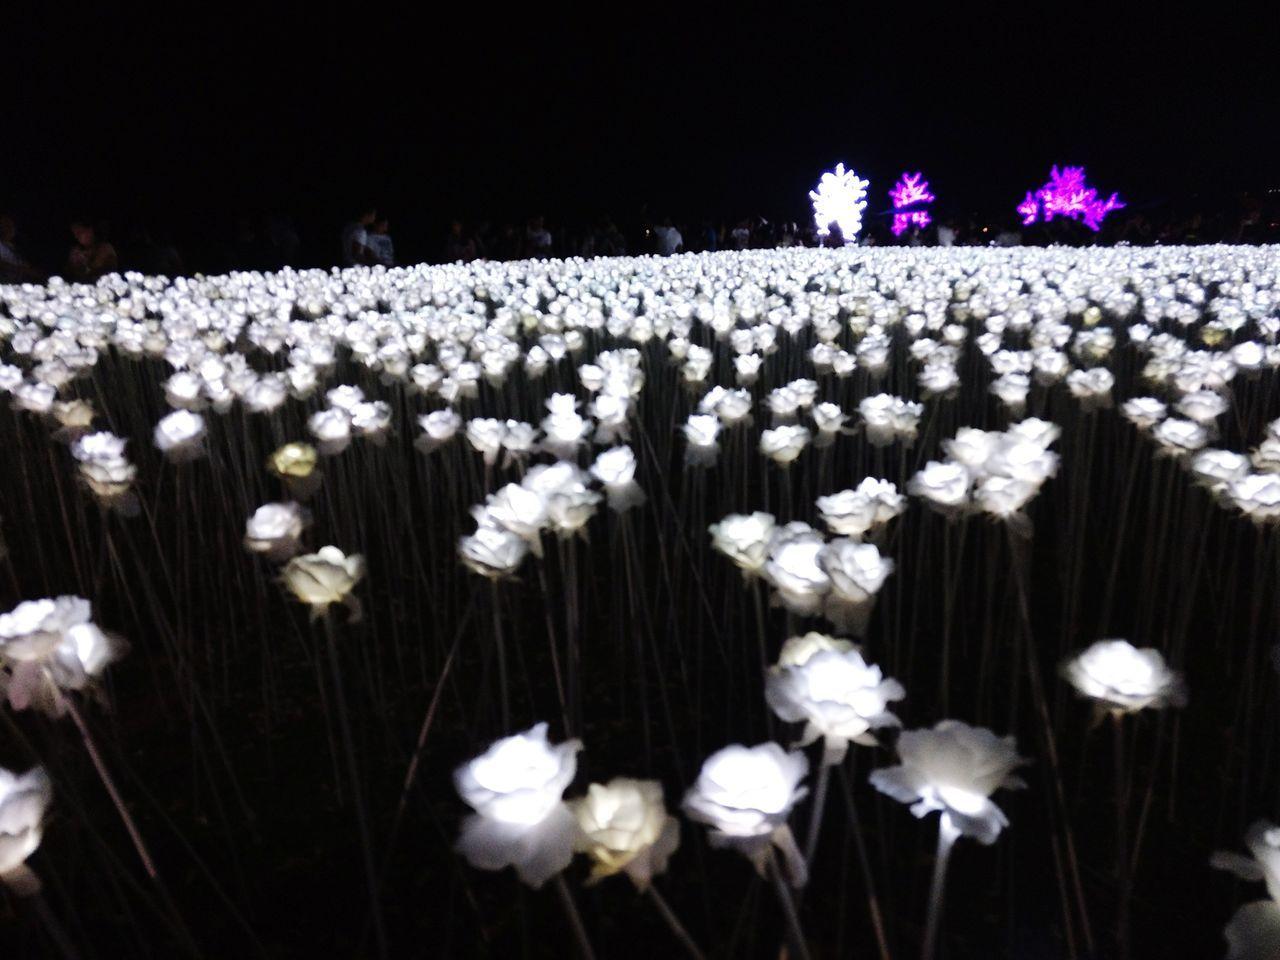 10,000 LED lights